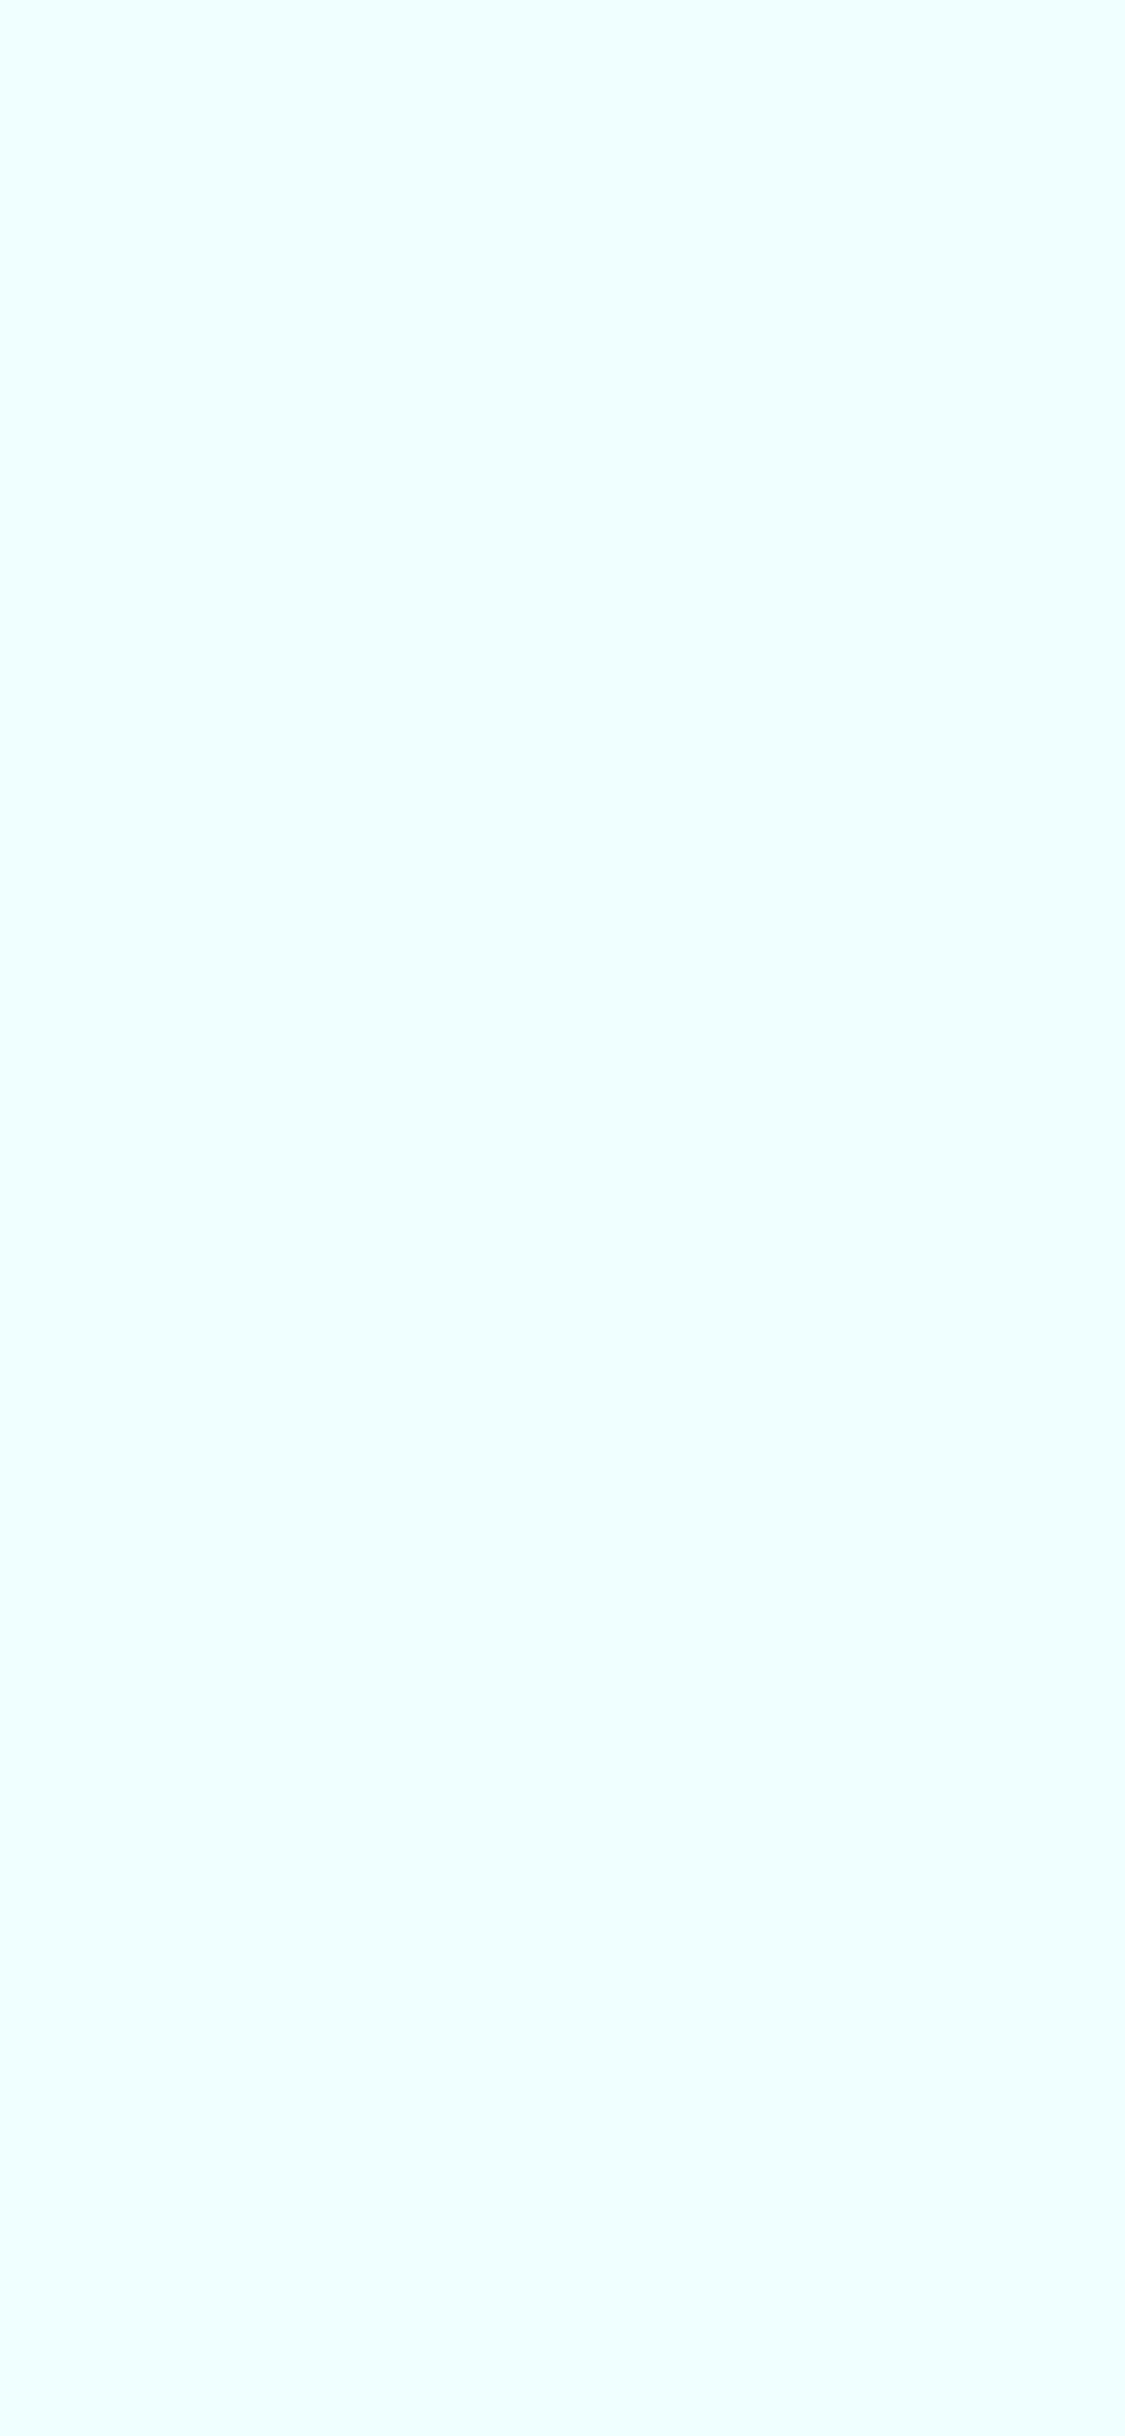 1125x2436 Azure Mist Solid Color Background